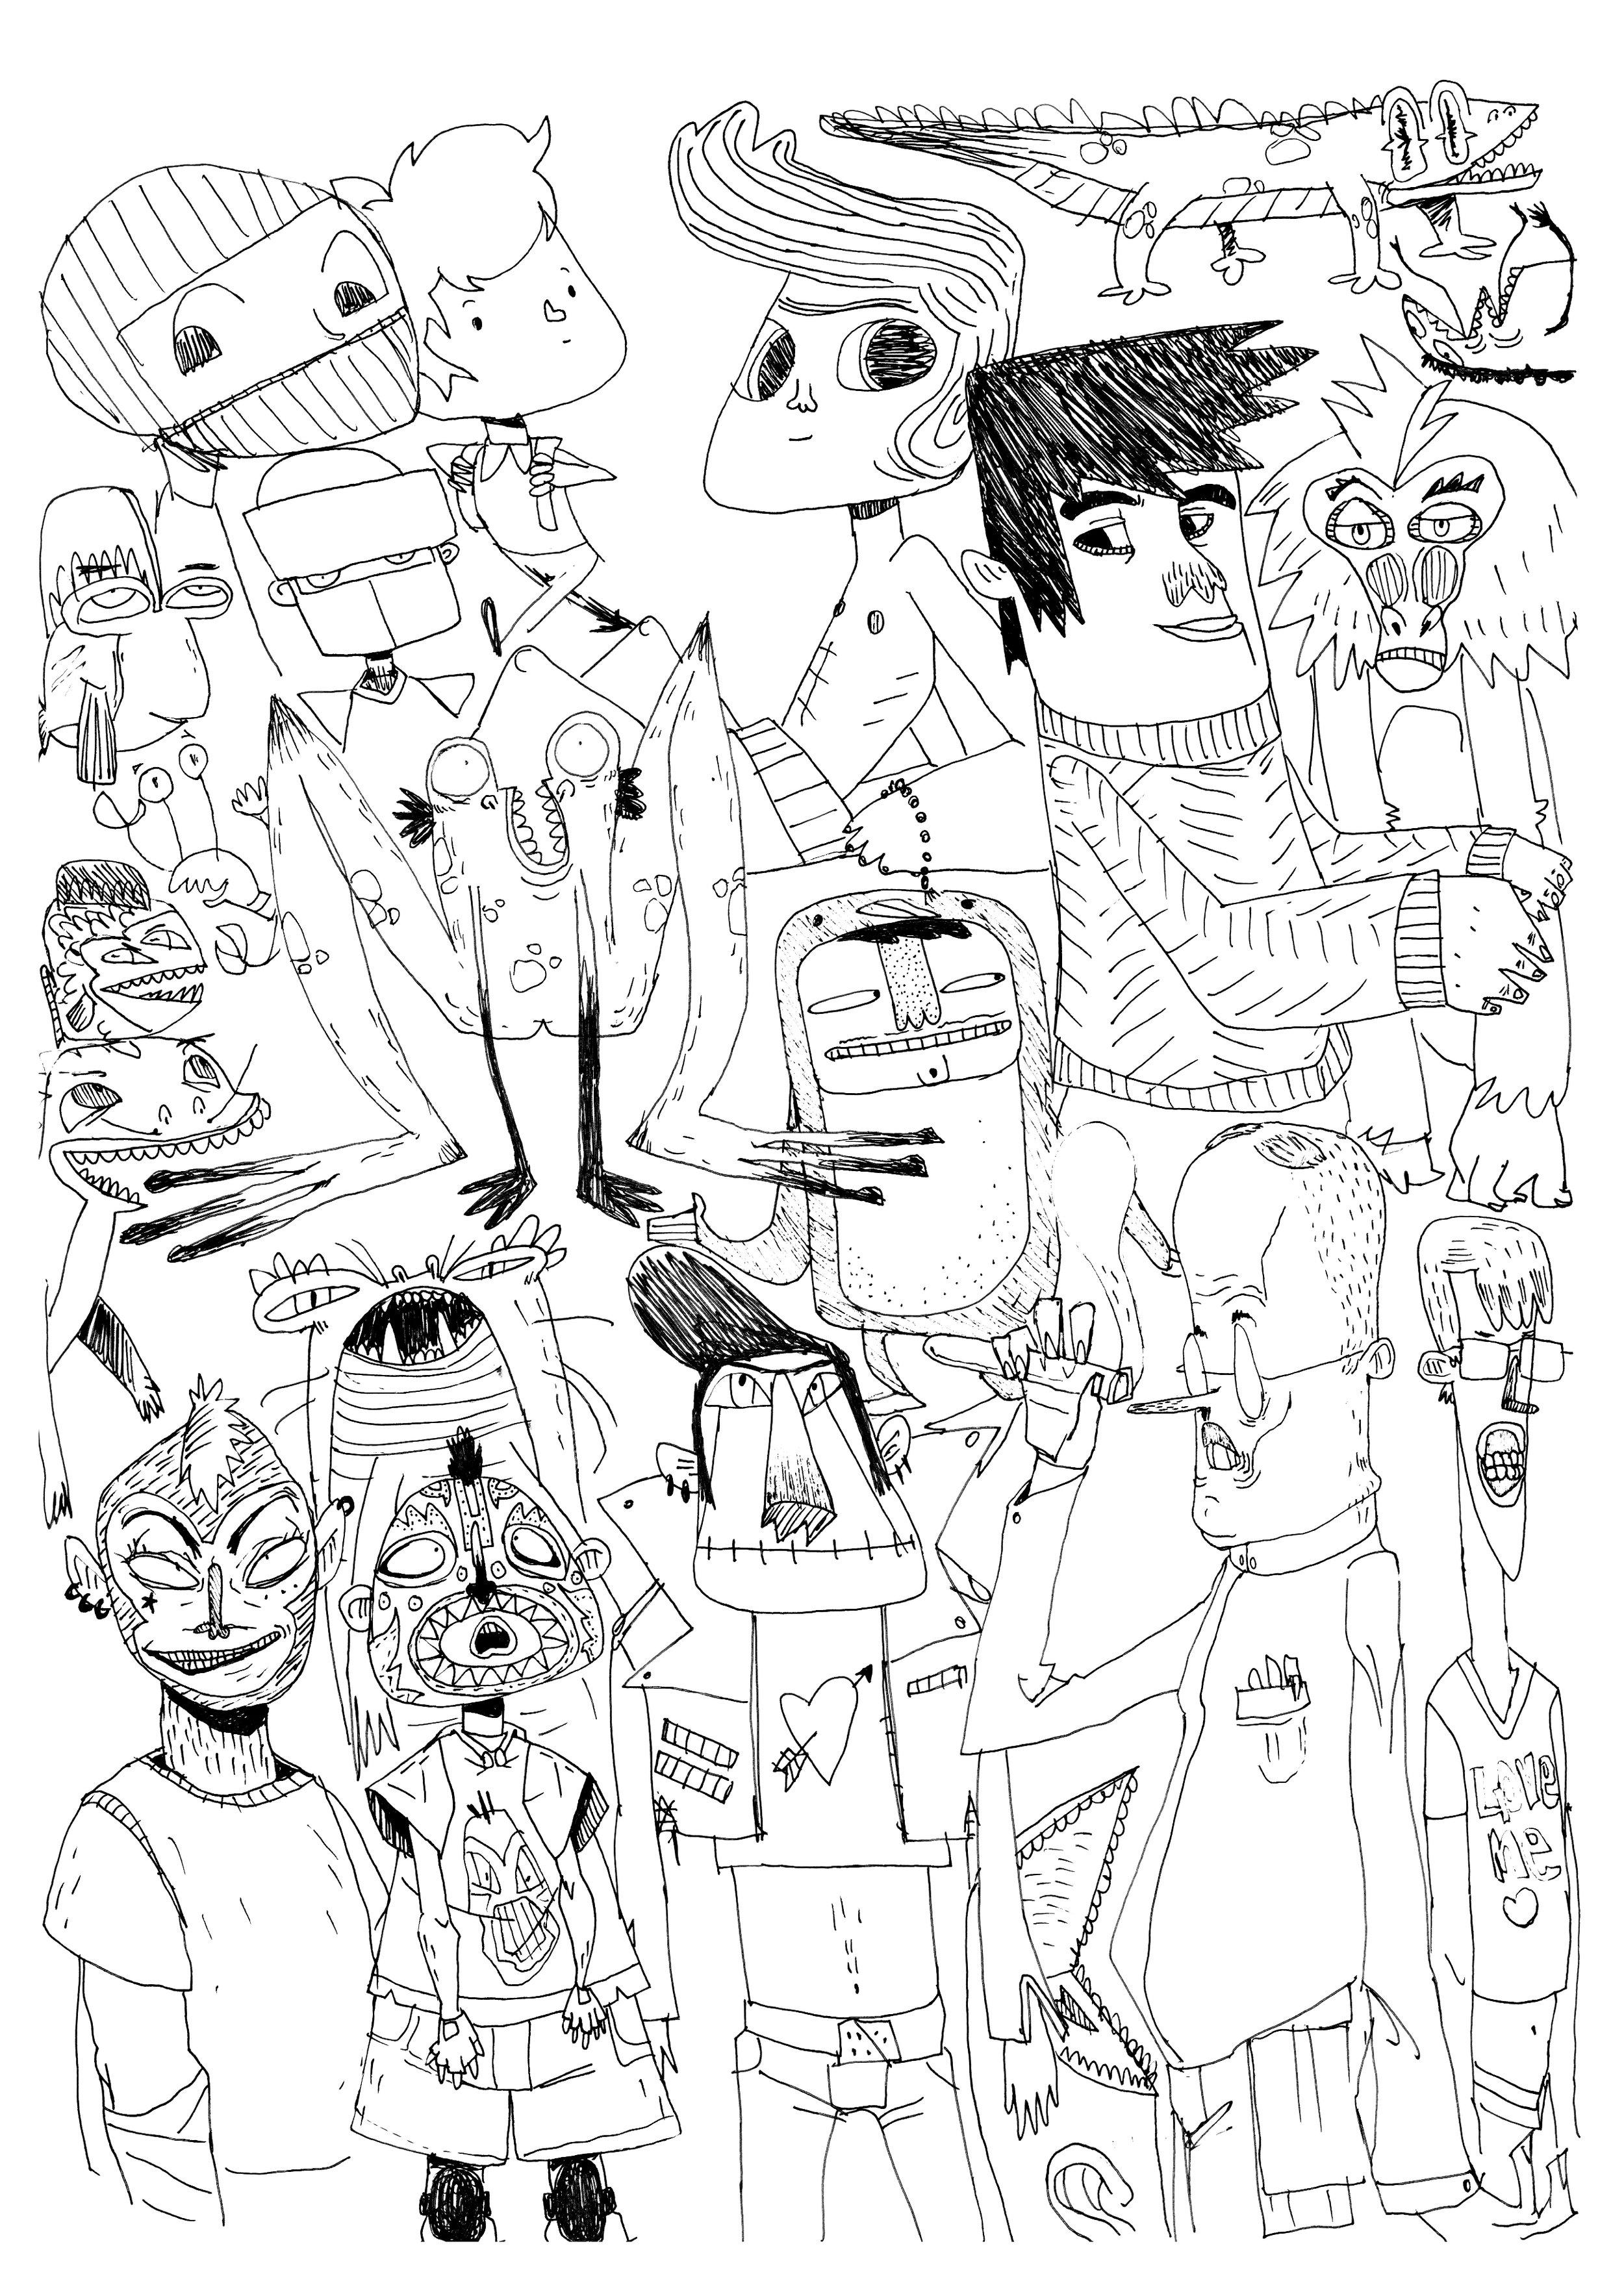 Pascal_Zaffiro_Doodle_19.jpg